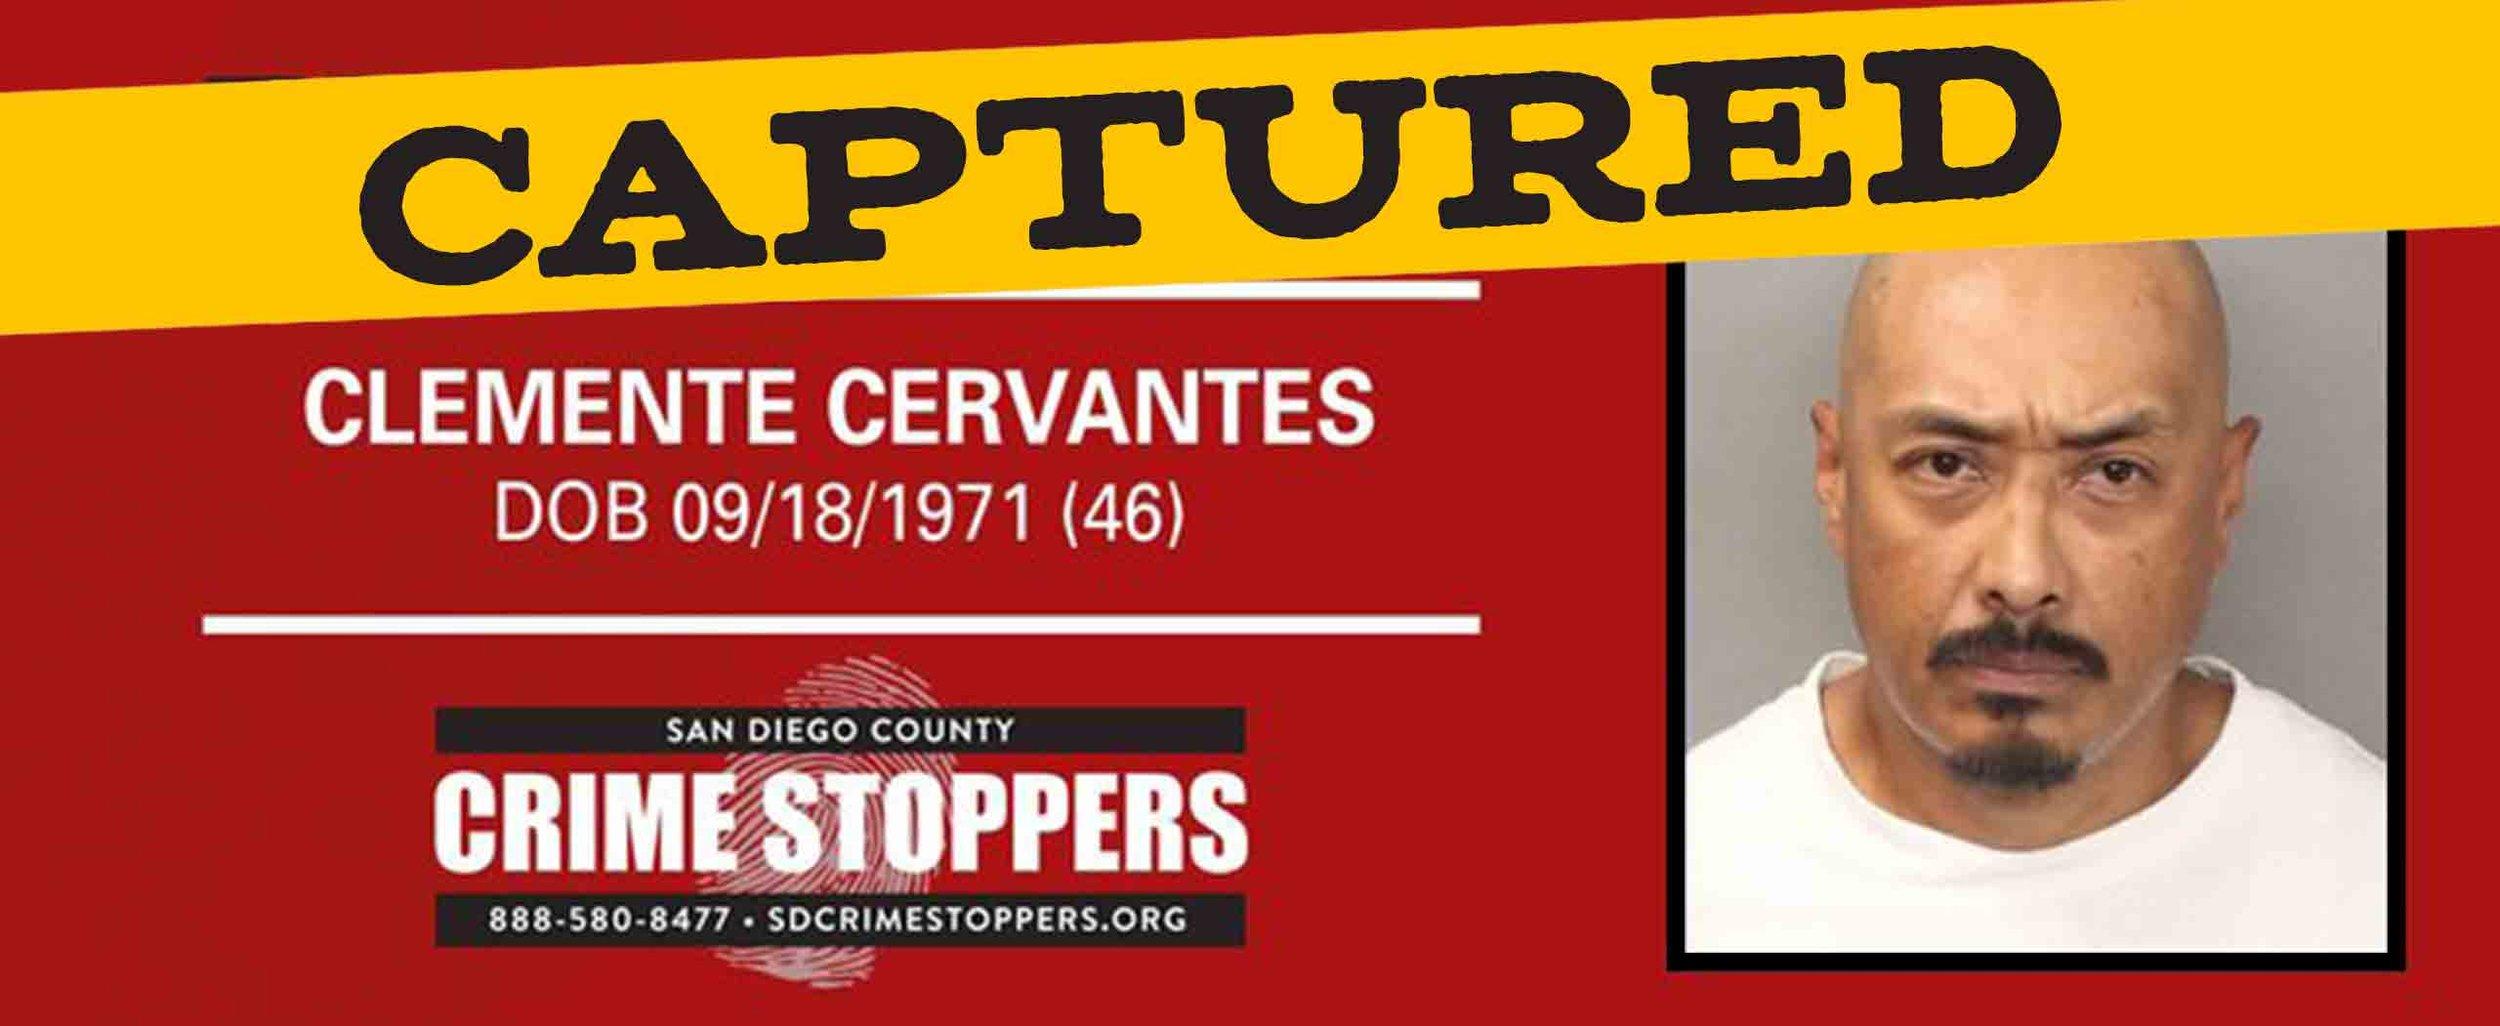 Clemente-Cervantes-Banner.jpg